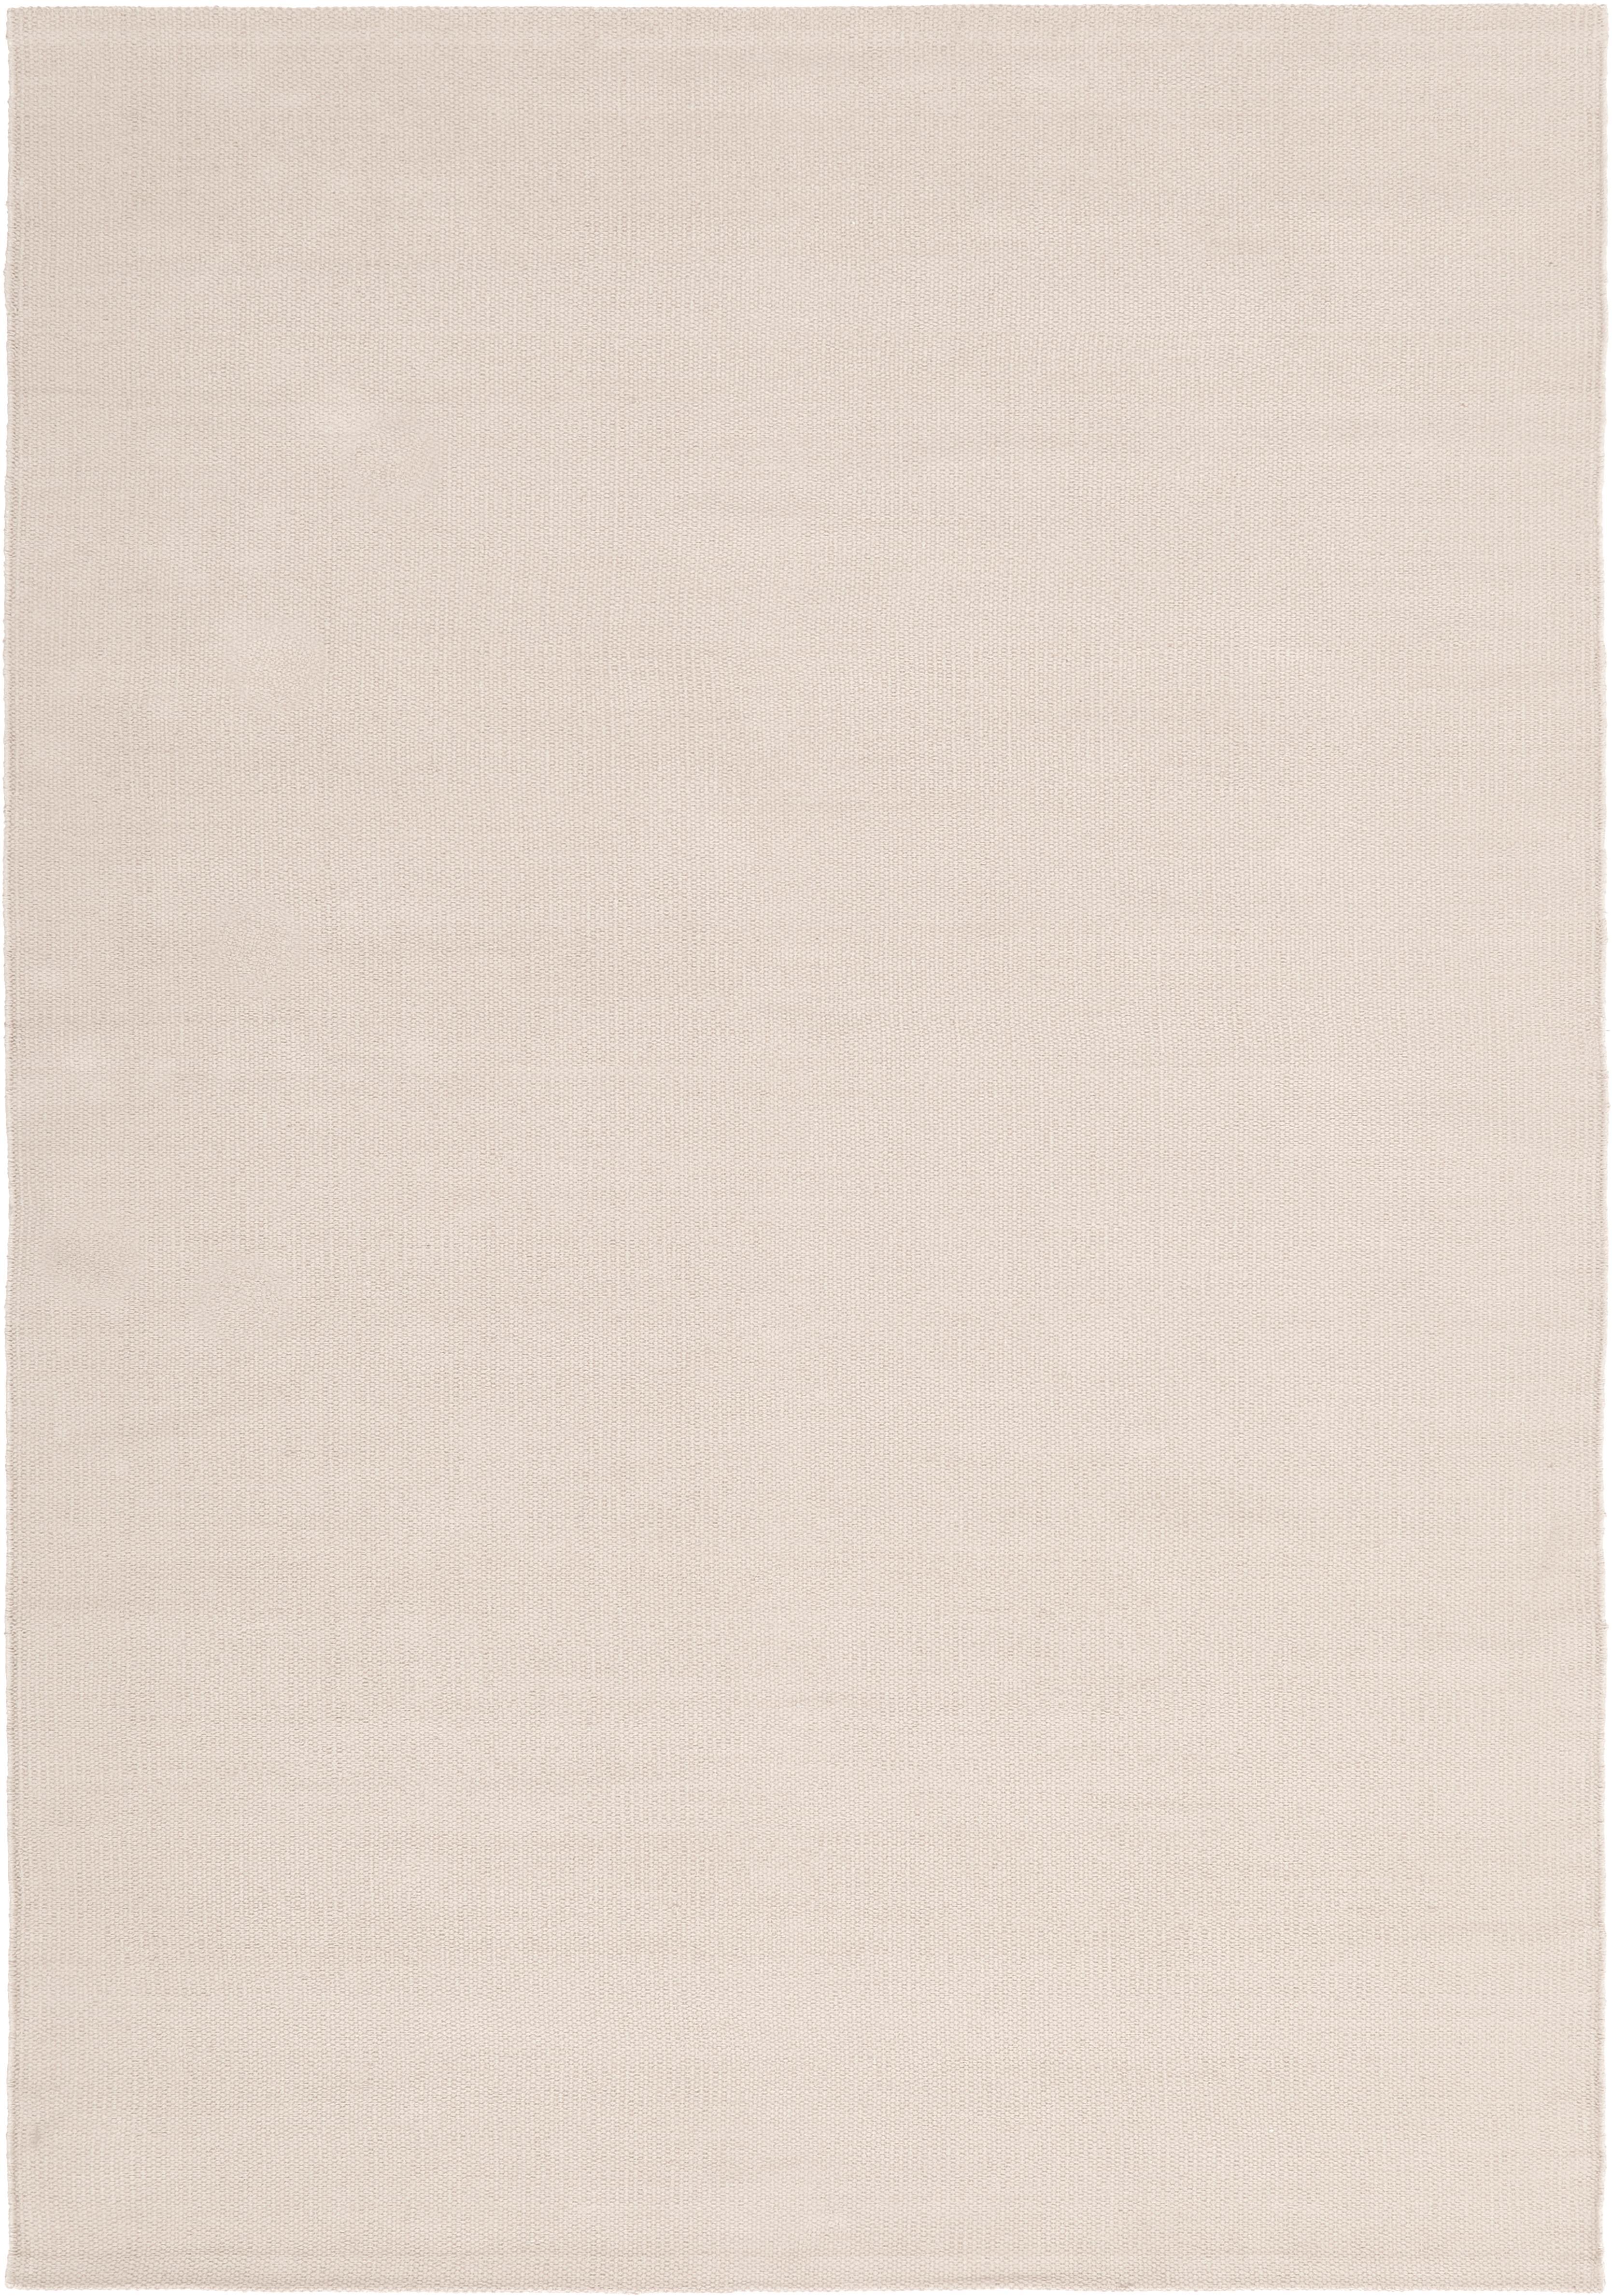 Alfombra artesanal de algodón Agneta, 100%algodón, Gris pardo, An 160 x L 230  cm(Tamaño M)